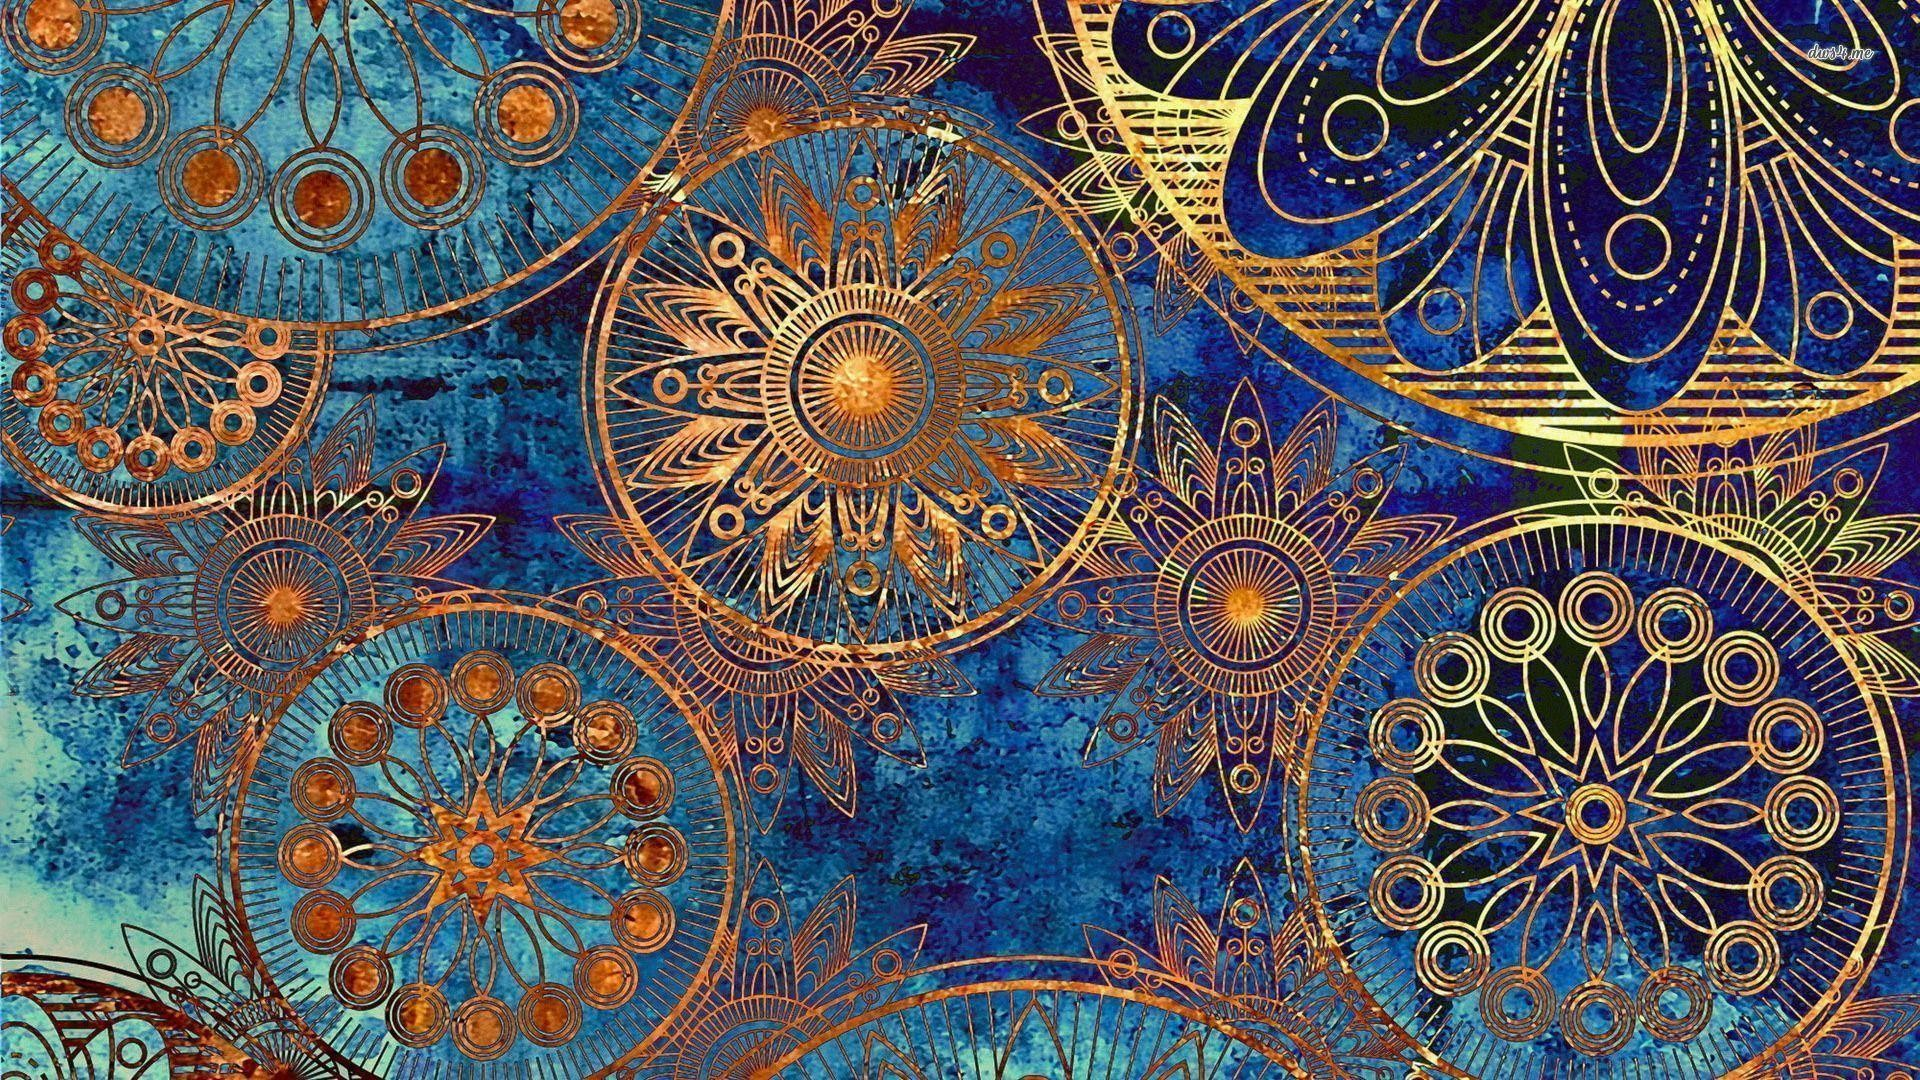 Mandala Wallpaper HD (69+ images)